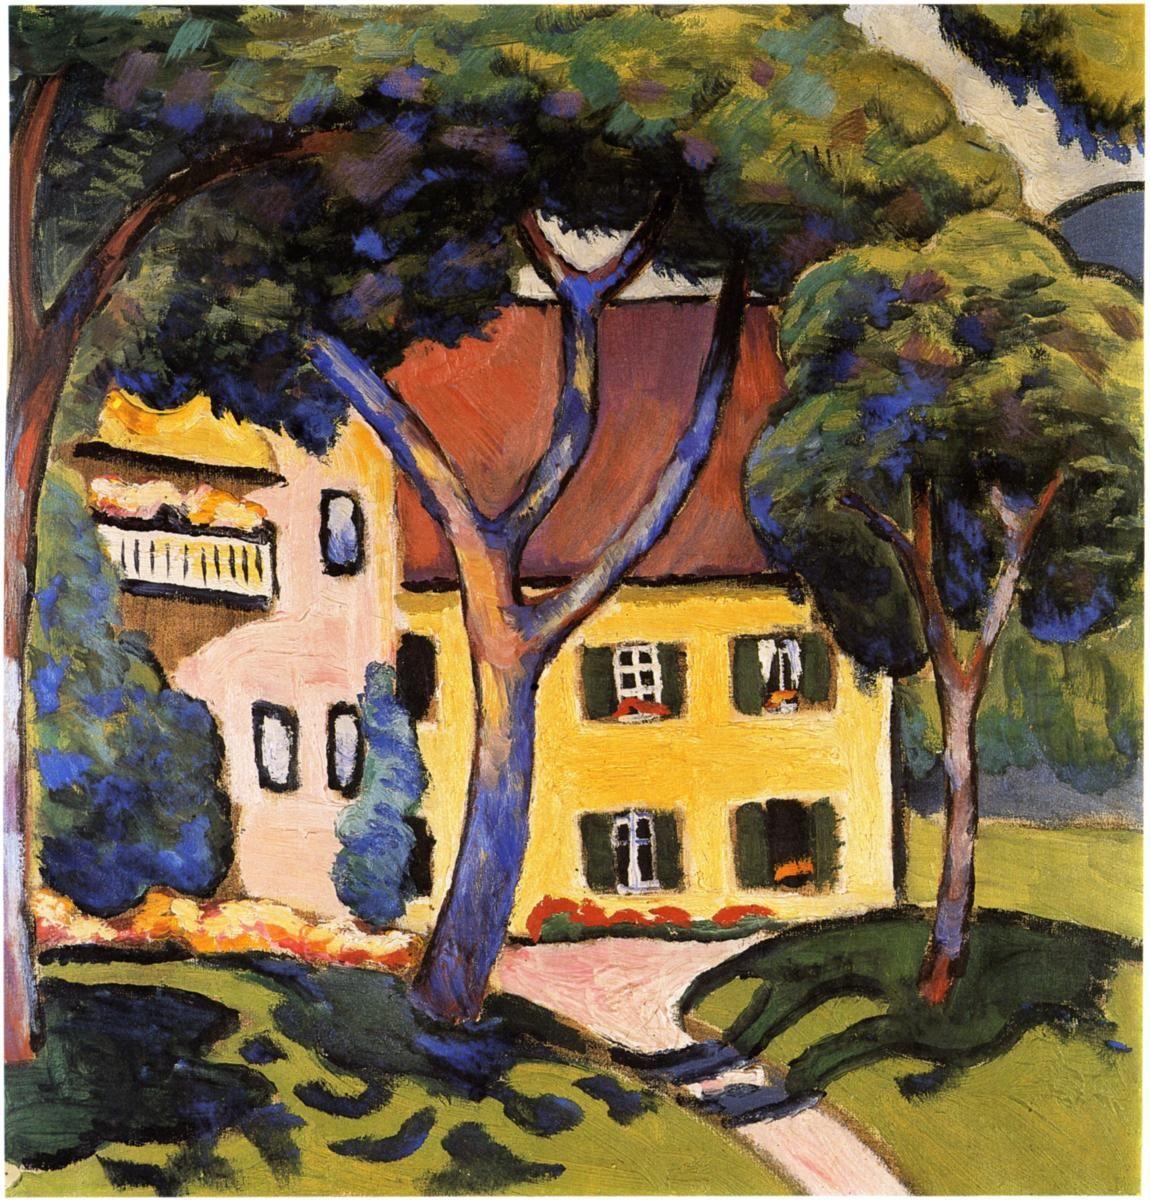 House in a landscape / Macke